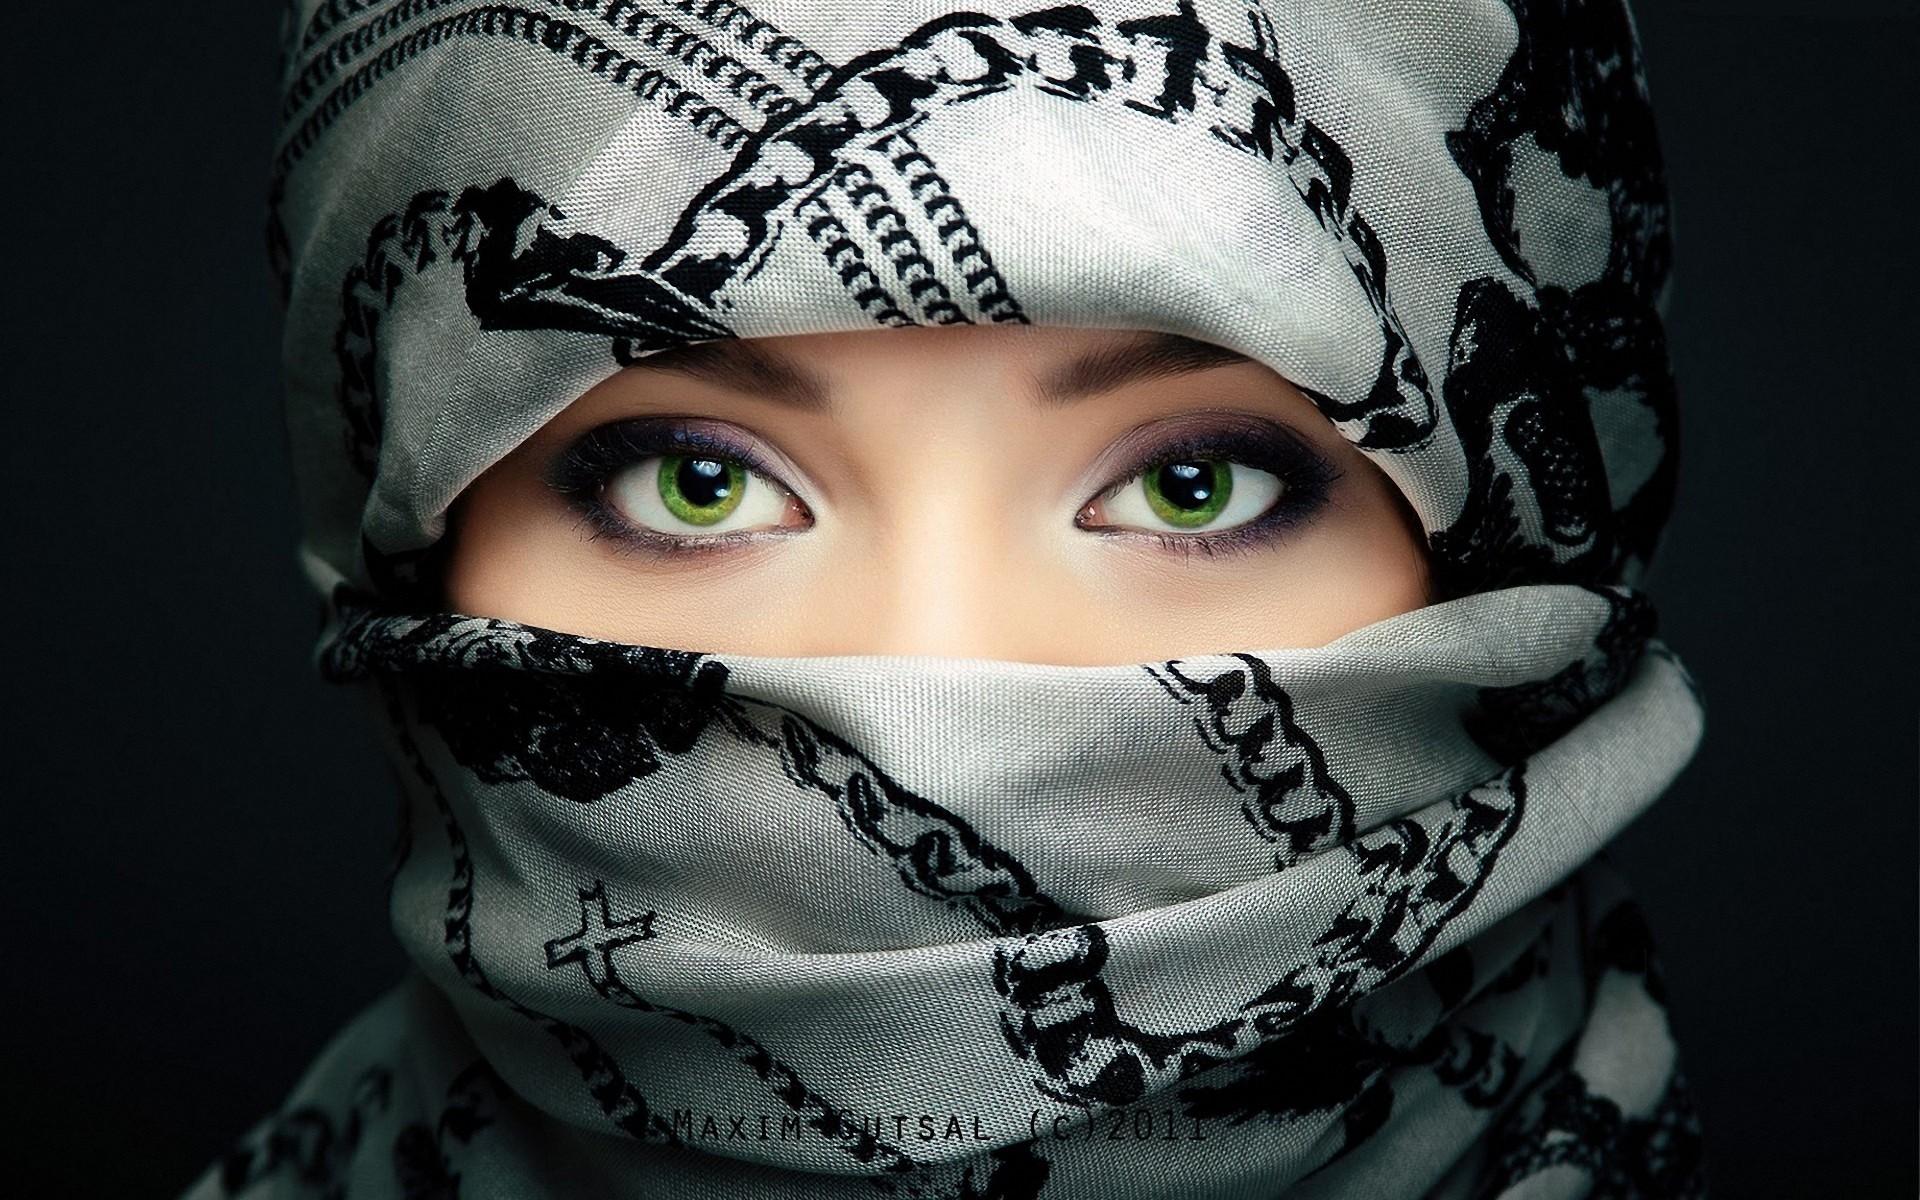 Free Amateur Homemade Porn Videos Photos - Free Amateur Beautiful muslim girls photo